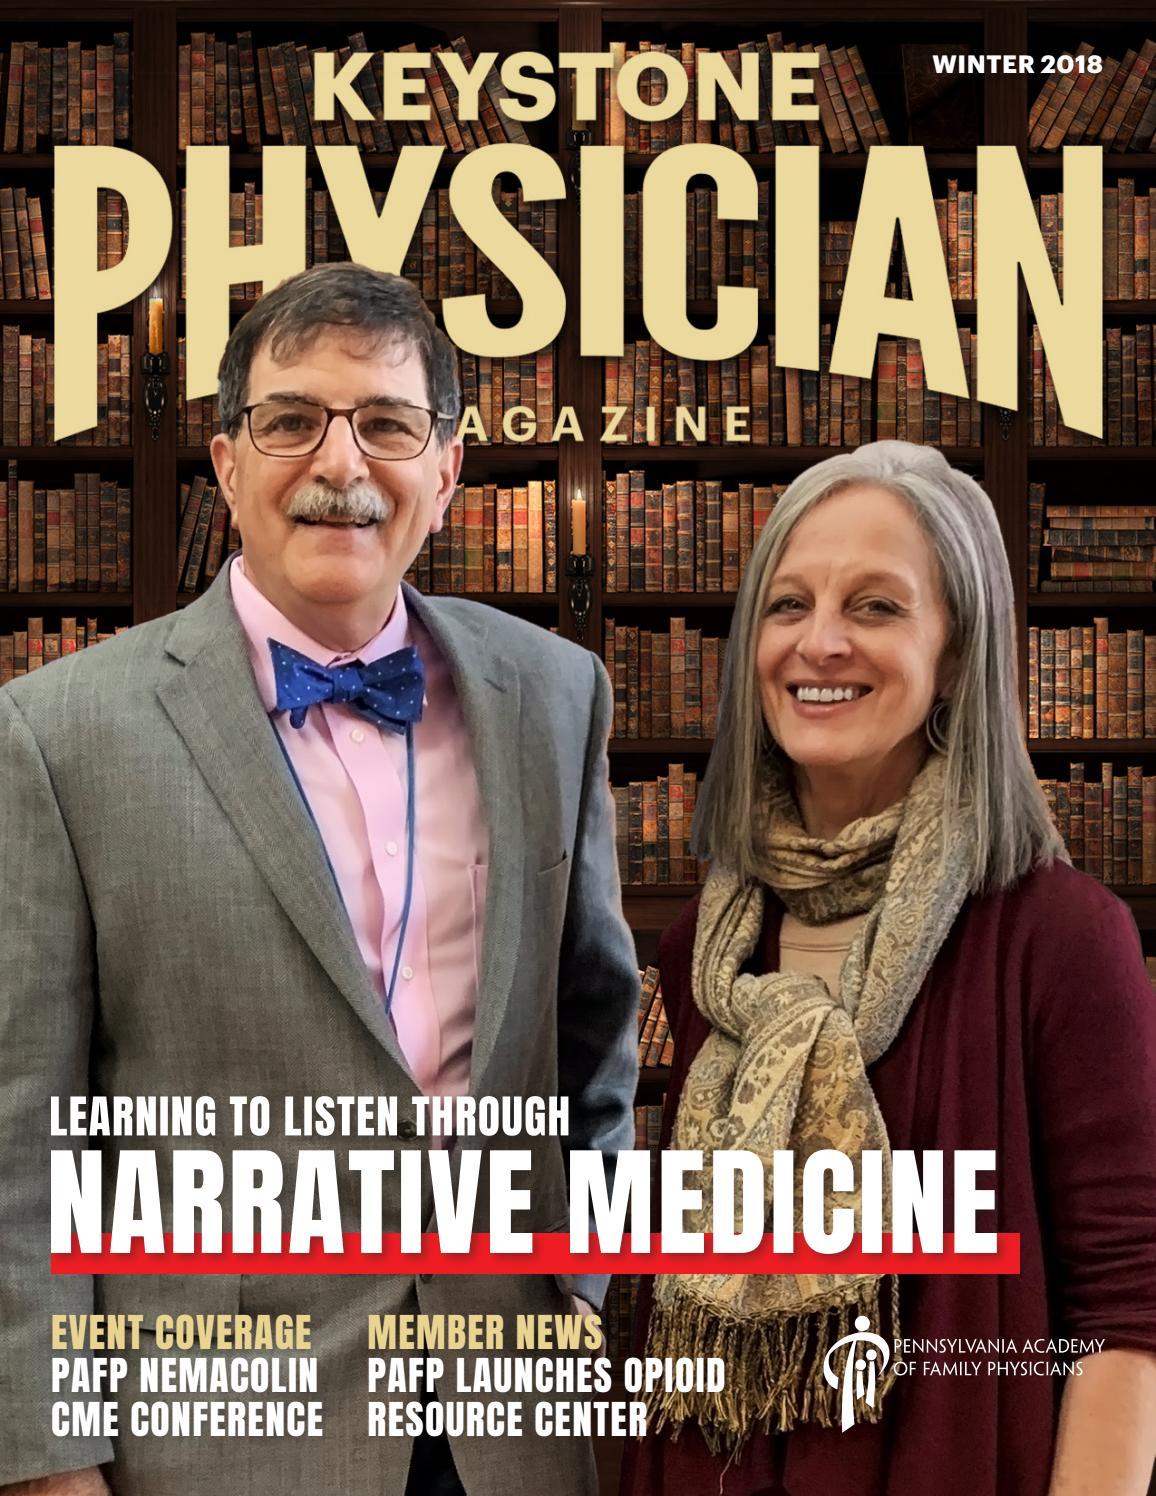 Keystone Physician Magazine - Winter 2018 by PA Academy of